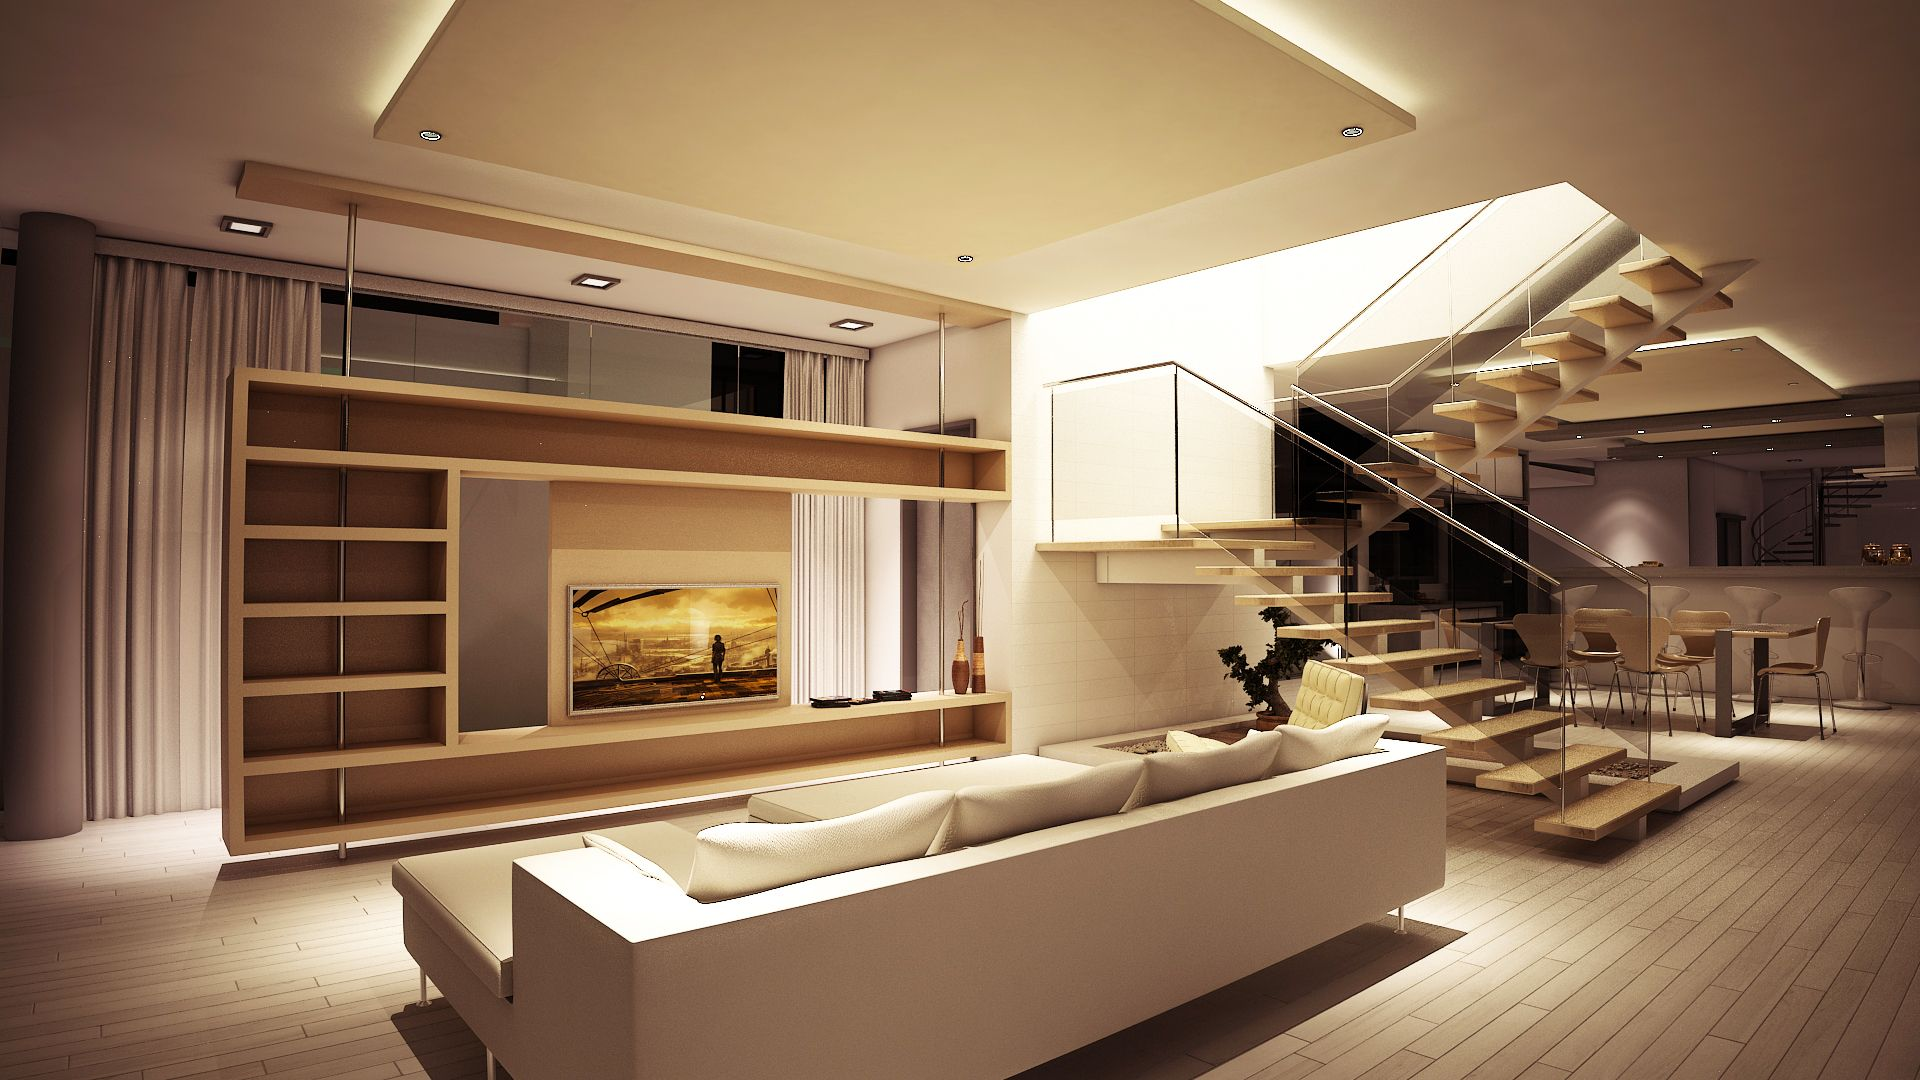 Piecerakkausbrdeviantartin Architecture The Best Sale Endearing Living Room Design 2014 2018